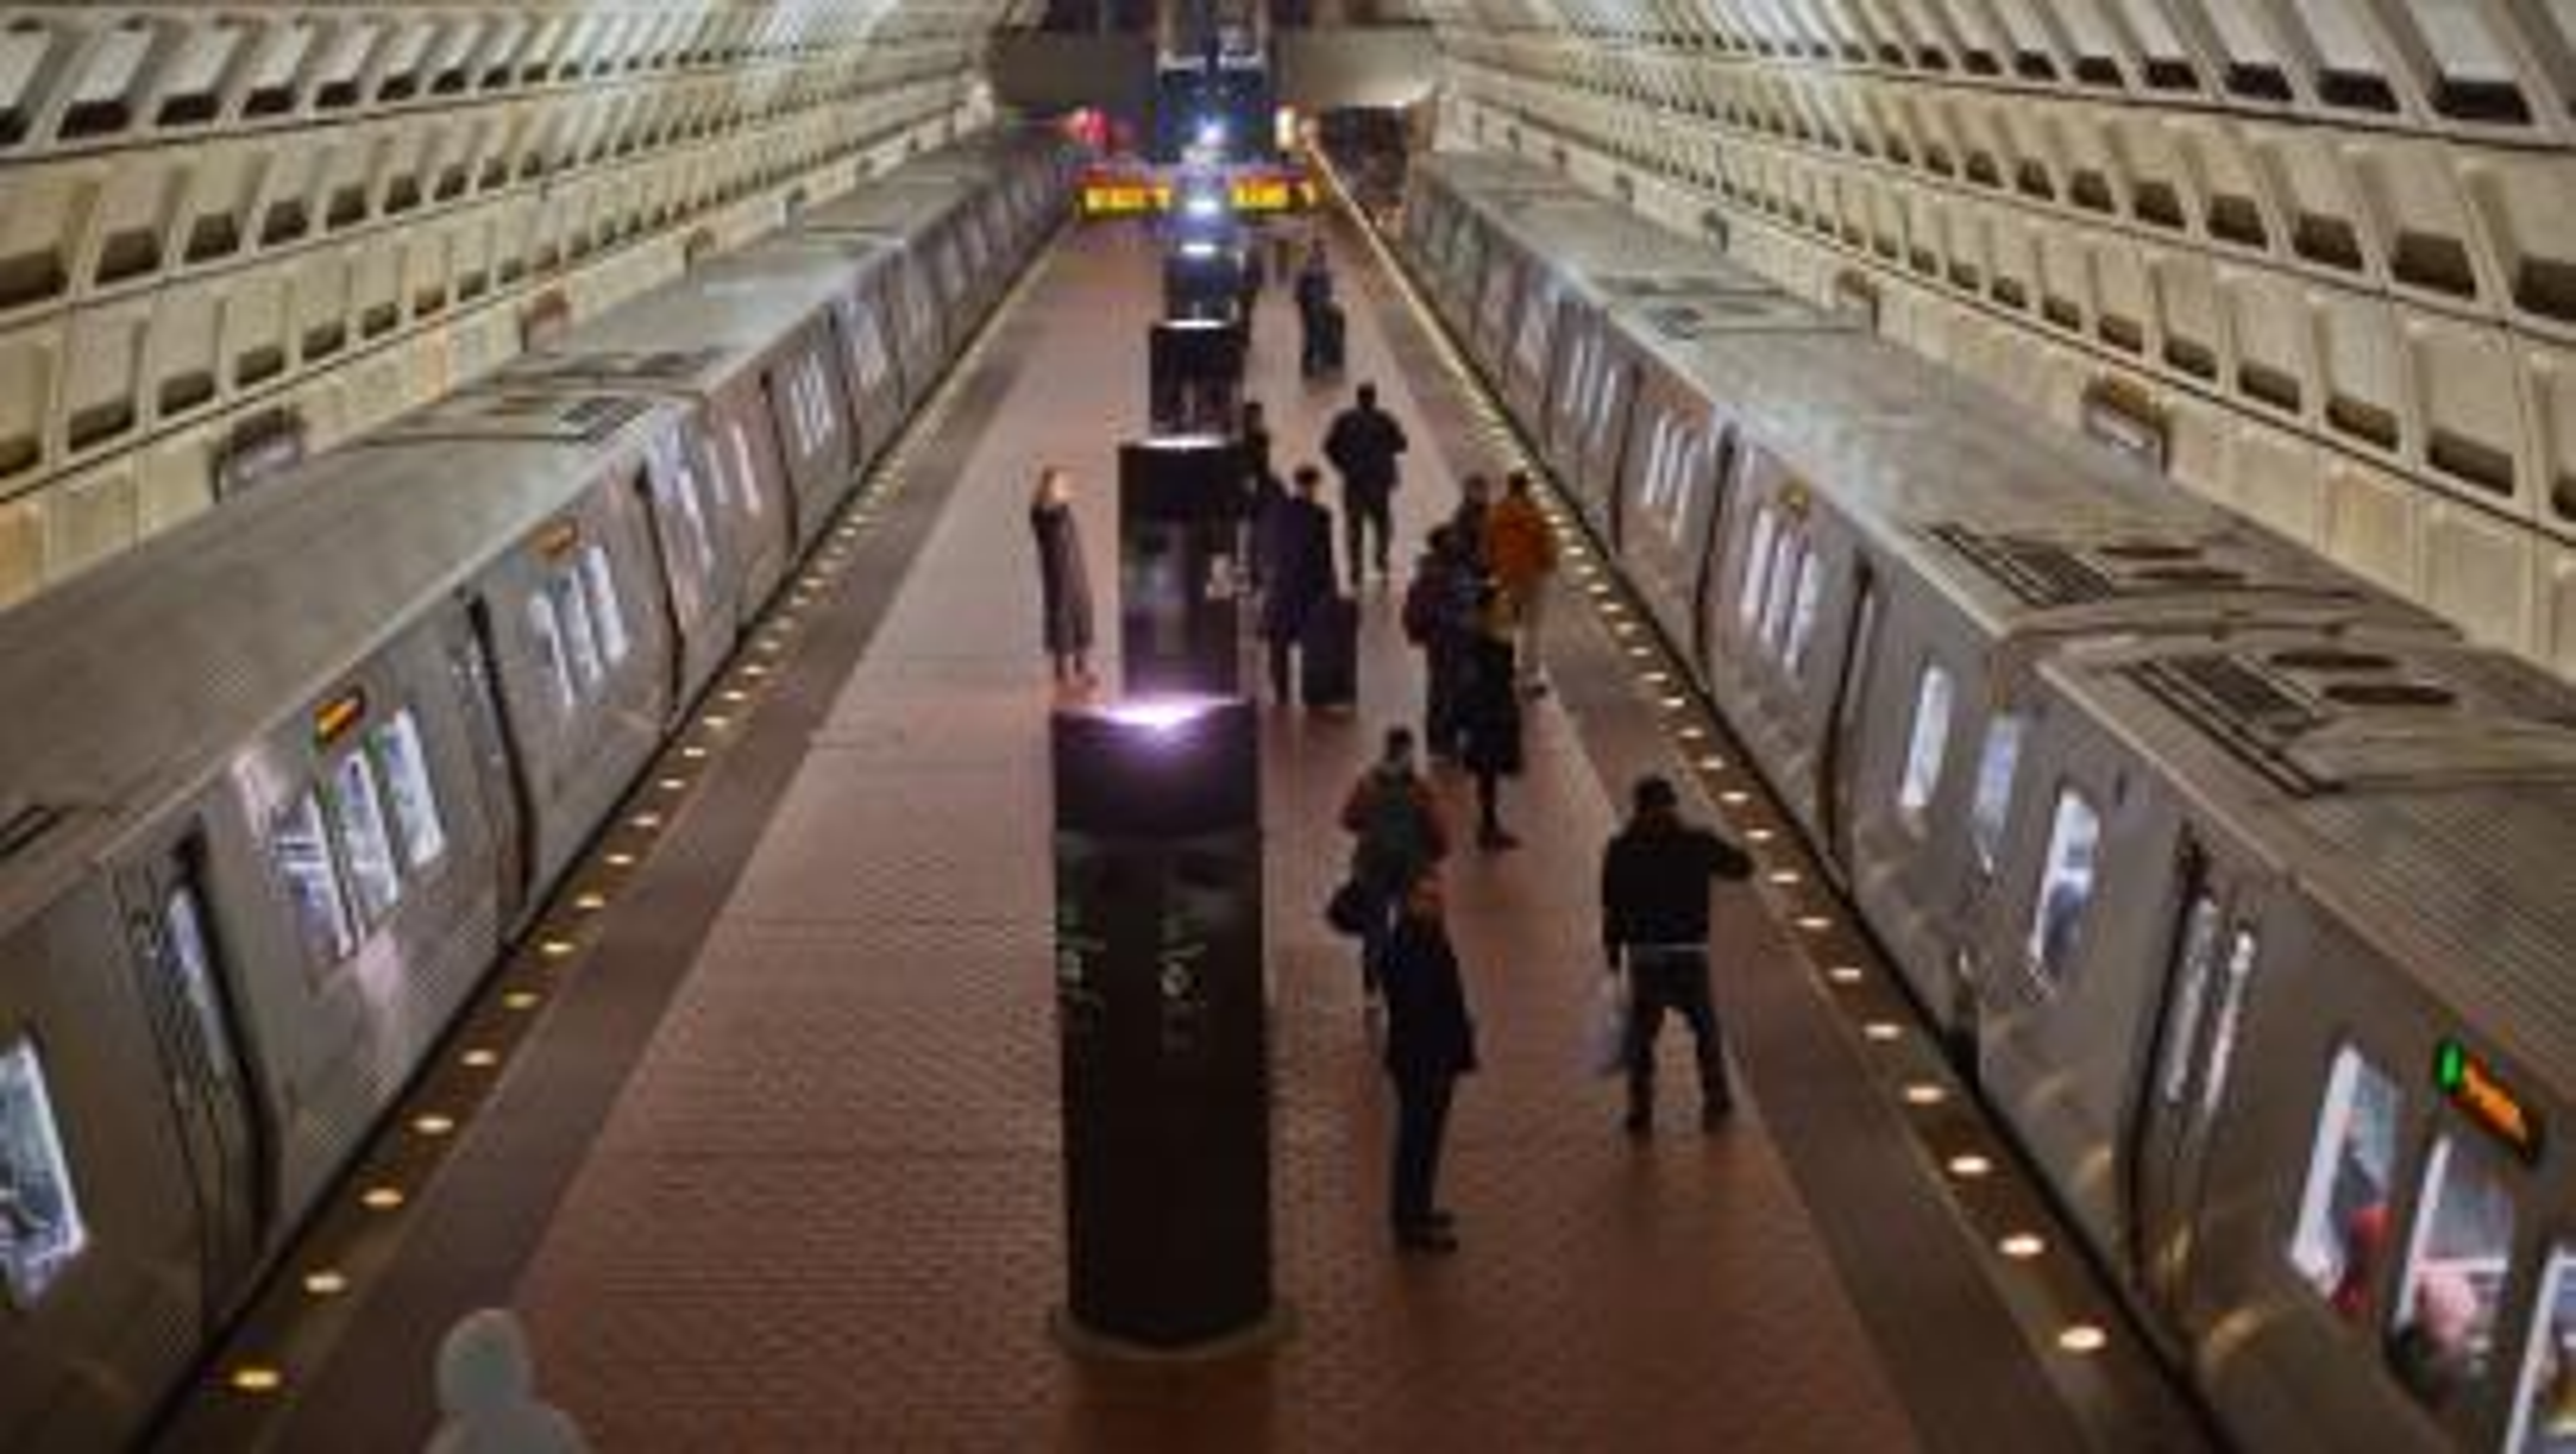 Passengers board subway trains at the Naval Yard-Ballpark Metro Station, Thursday, Feb. 8, 2018, part of the public transit network for Washington. (AP Photo/Pablo Martinez Monsivais)